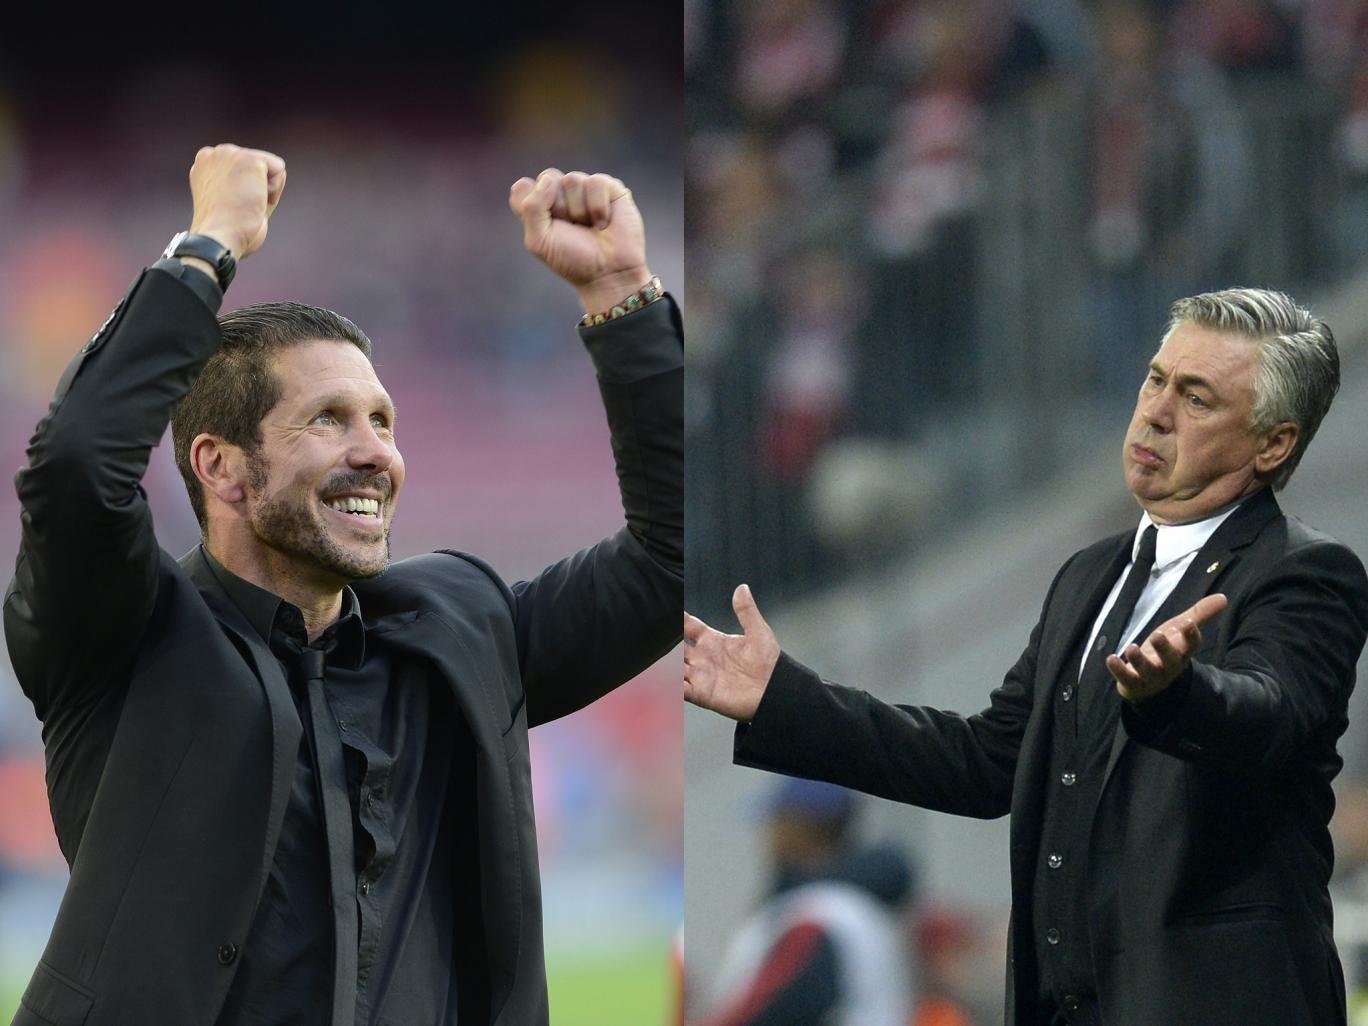 Diego Simeone and Carlo Ancelotti